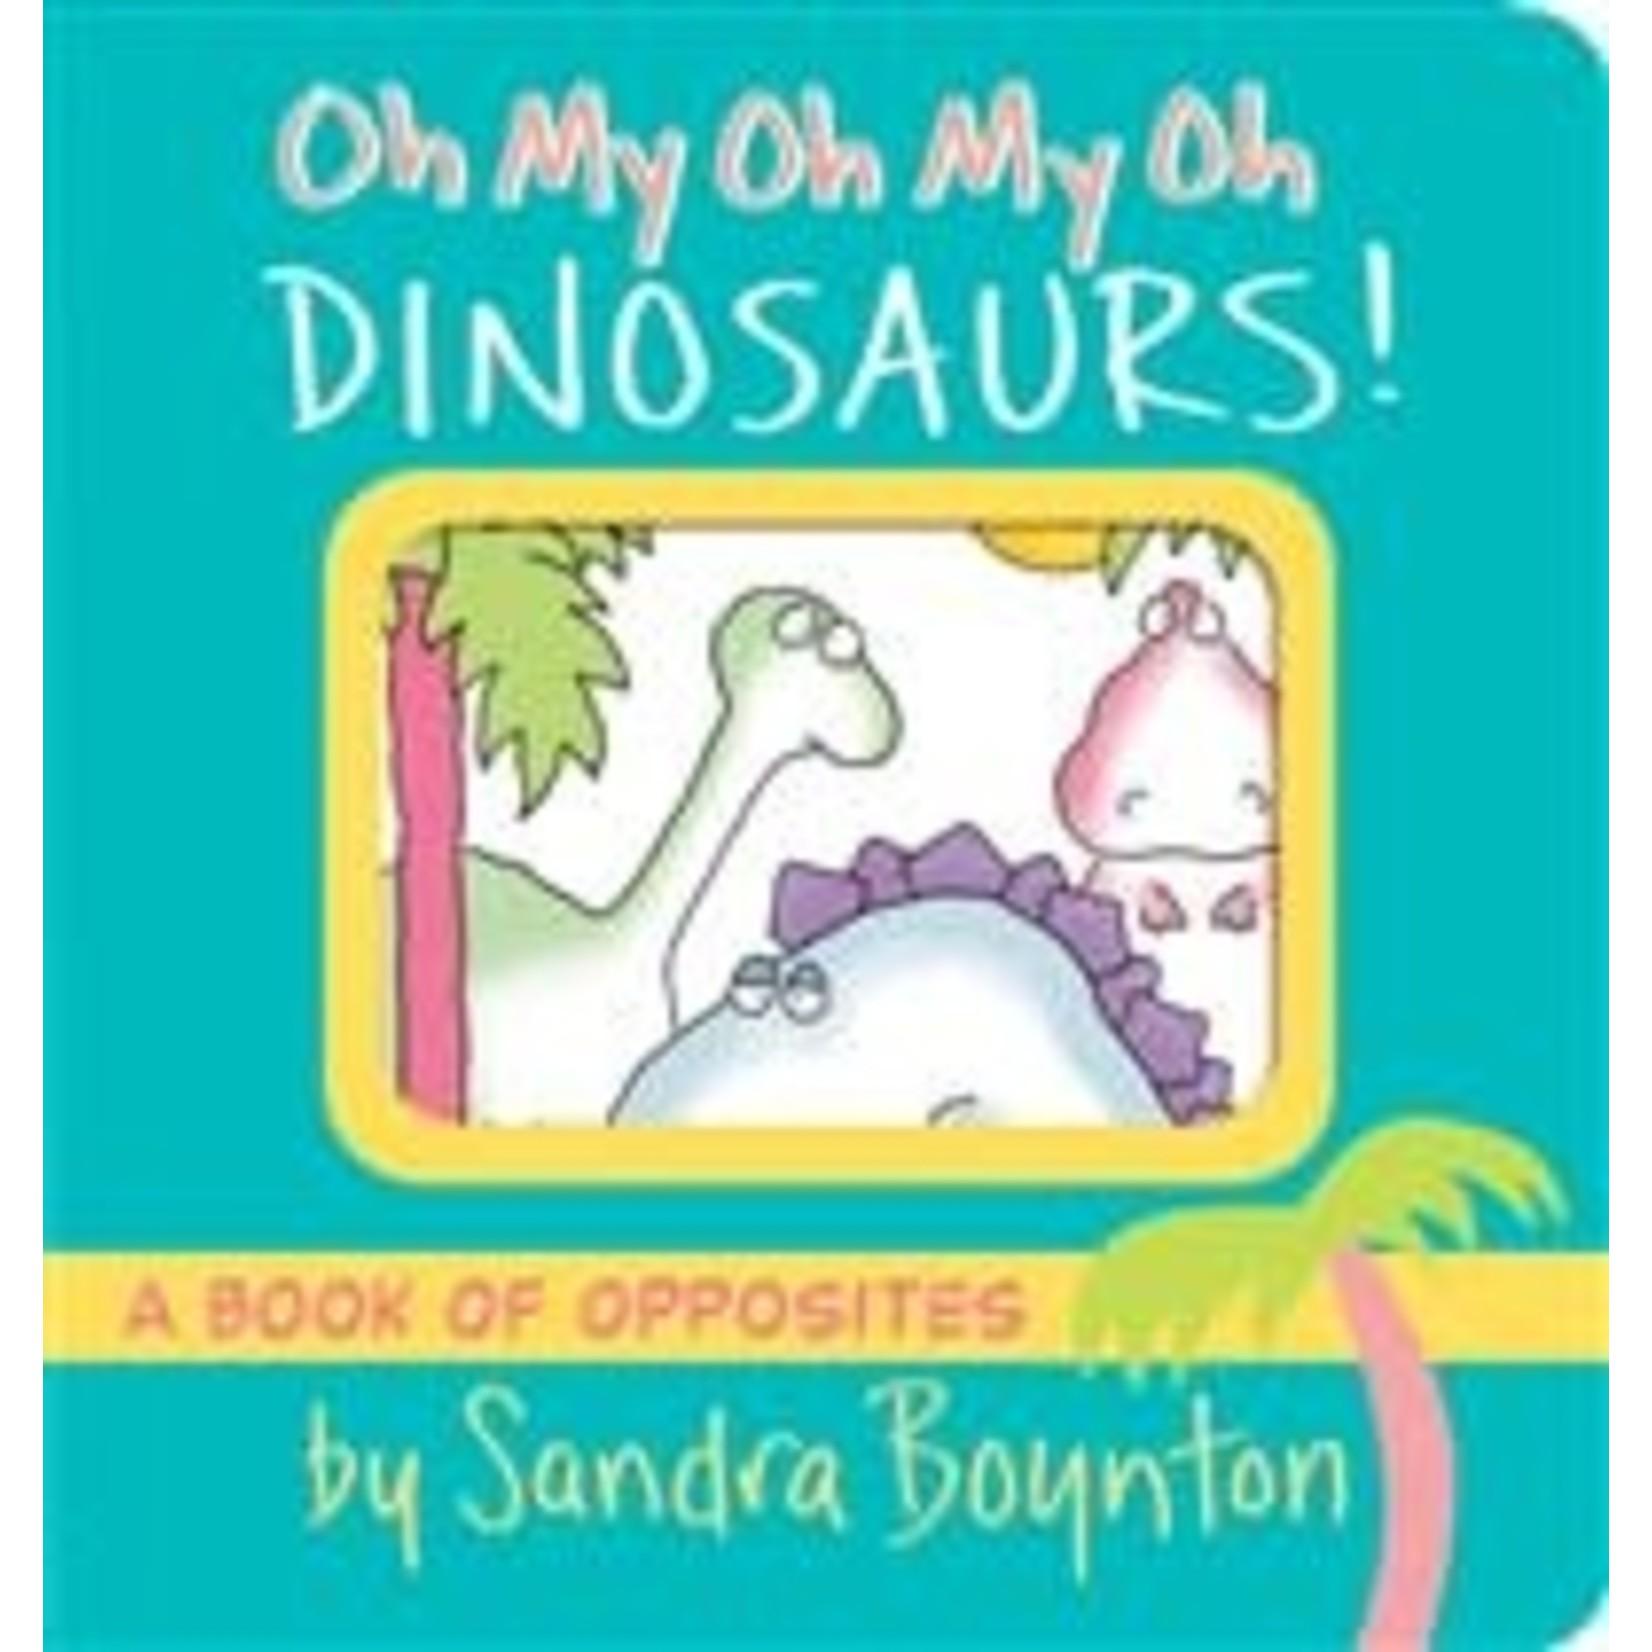 Sandra Boynton Oh My Oh My Oh Dinosaurs